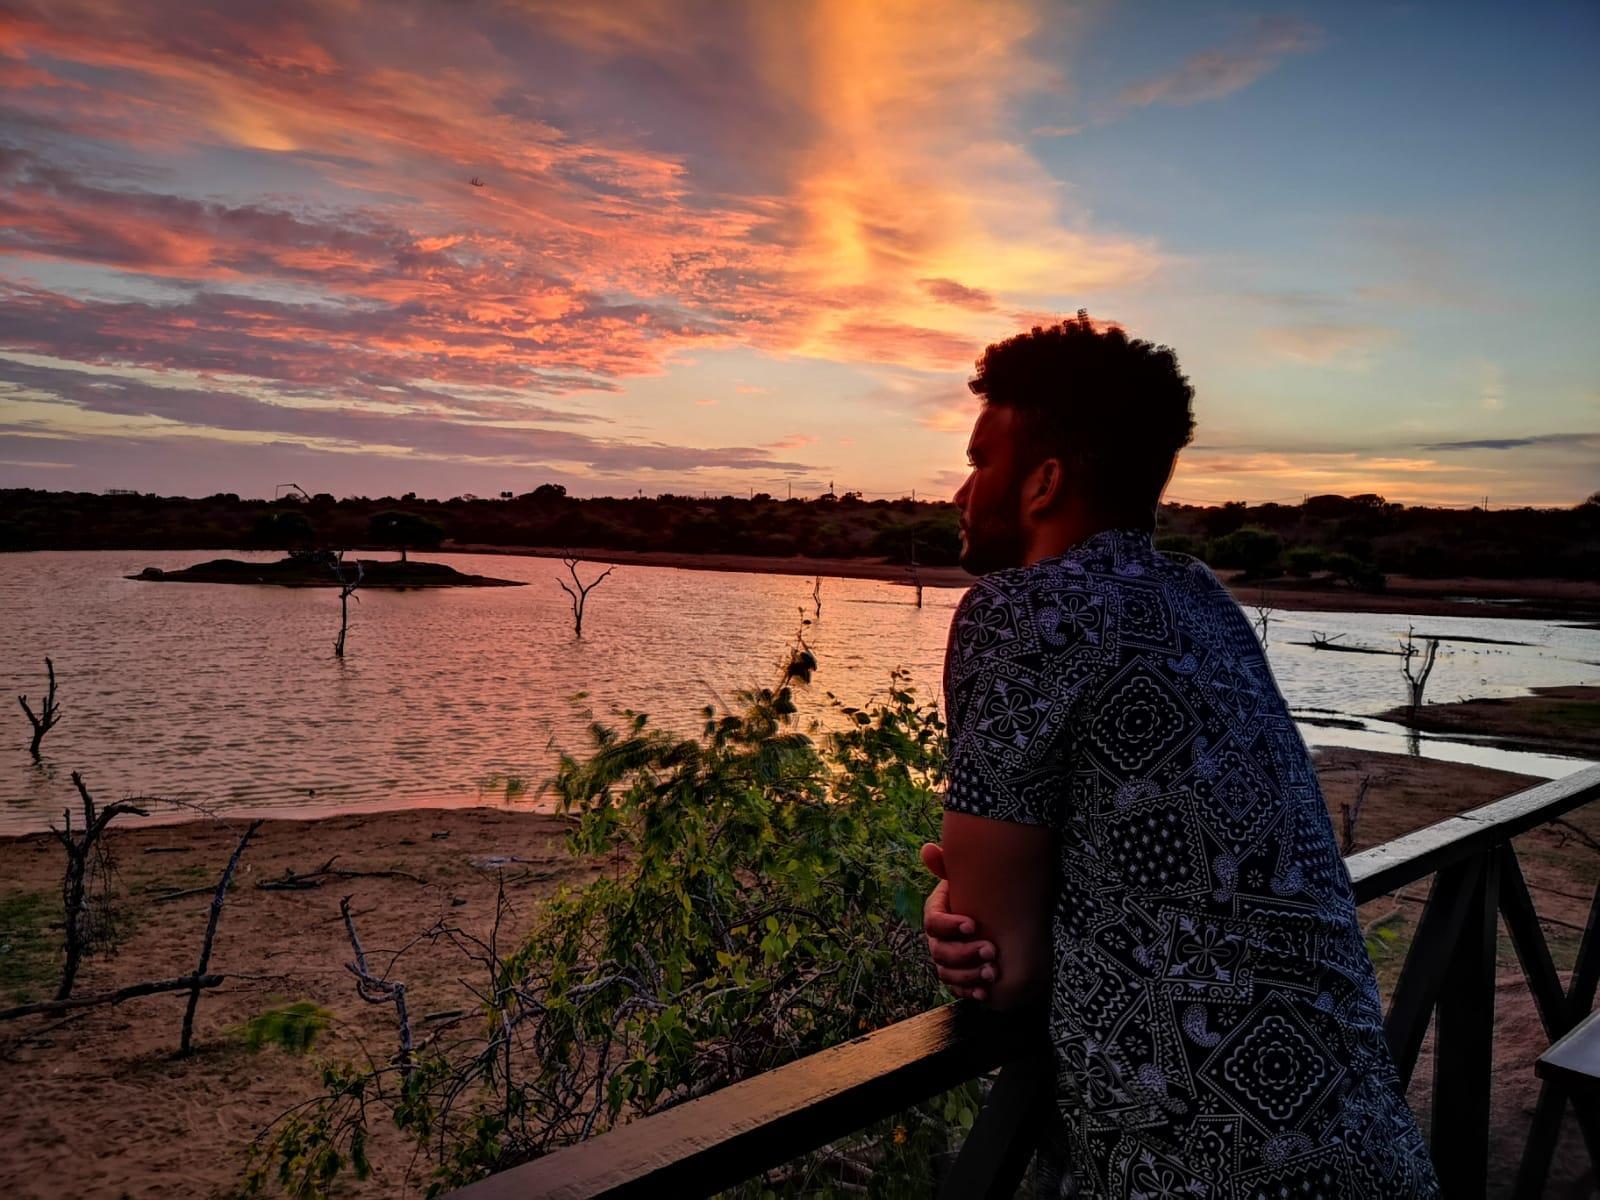 invite-to-paradise-sri-lanka-holiday-honeymoon-specialists-customer-feedback-elin-jordan-luce-yala-sunset.JPG